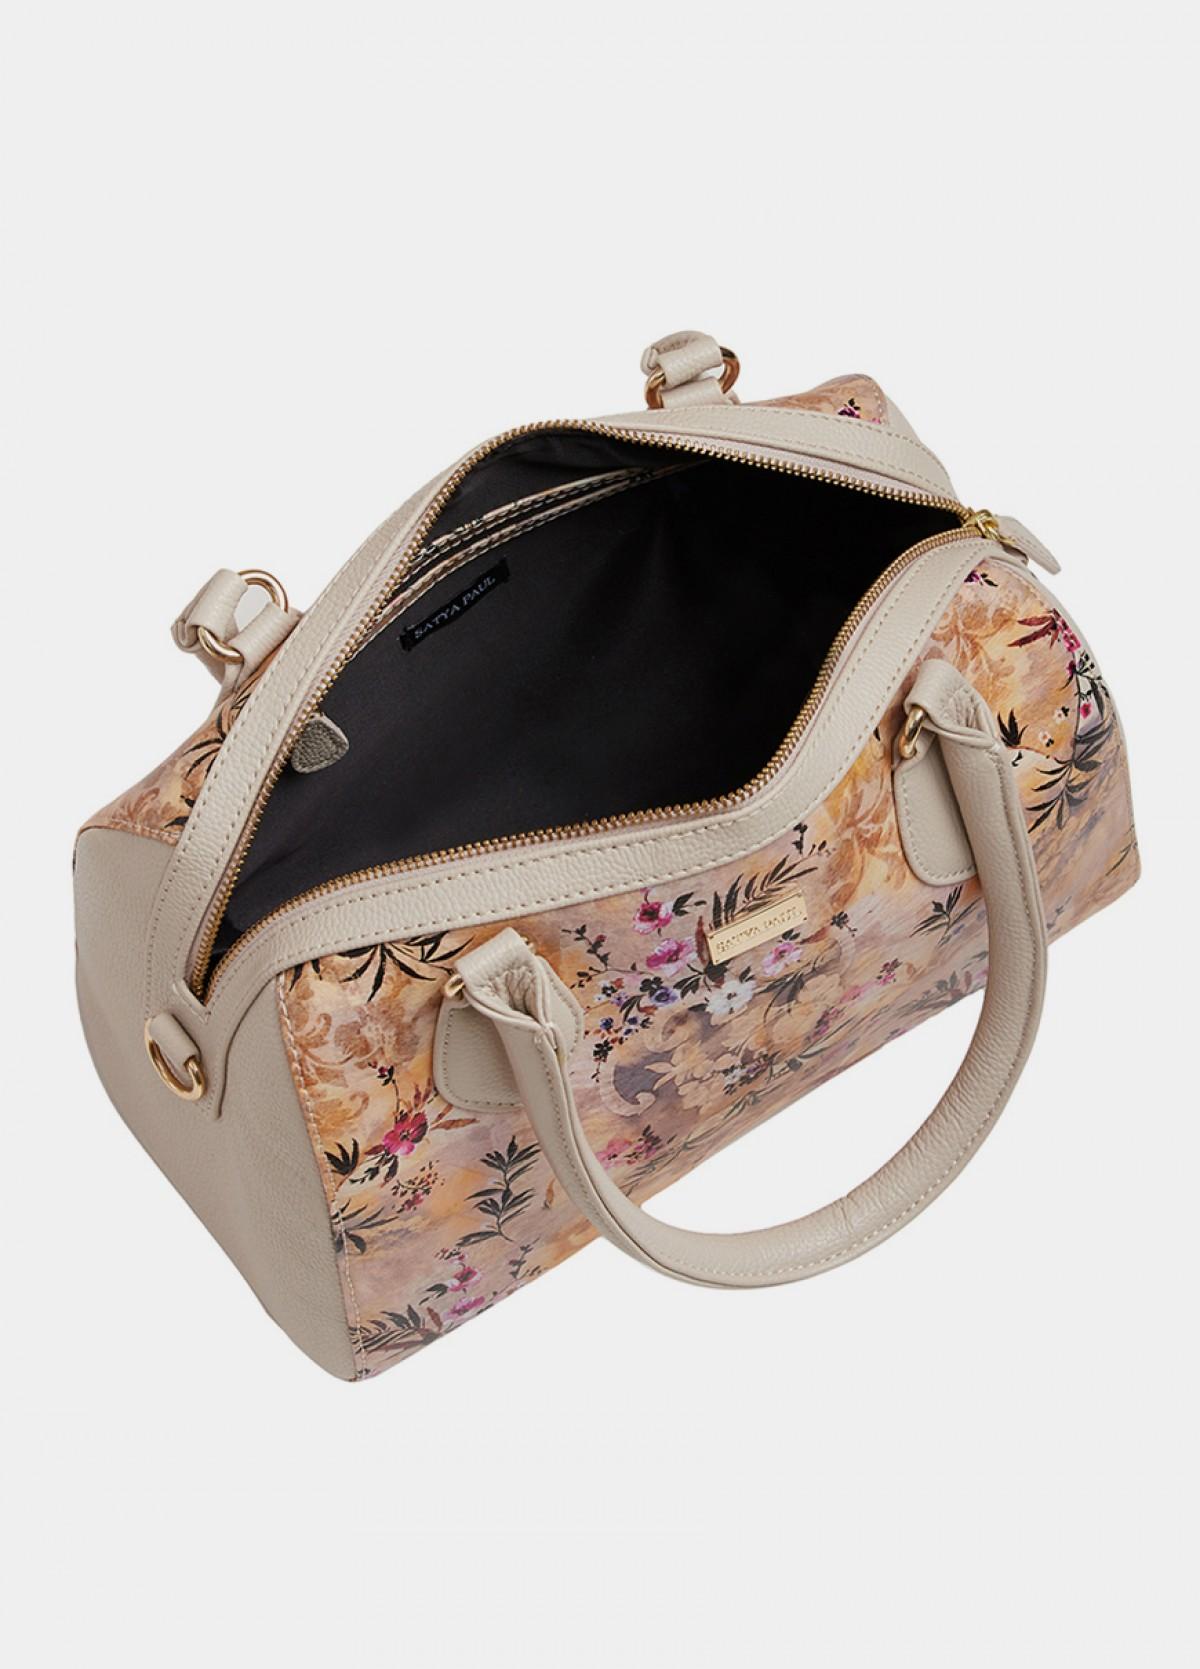 The Printed Bowling Handbag